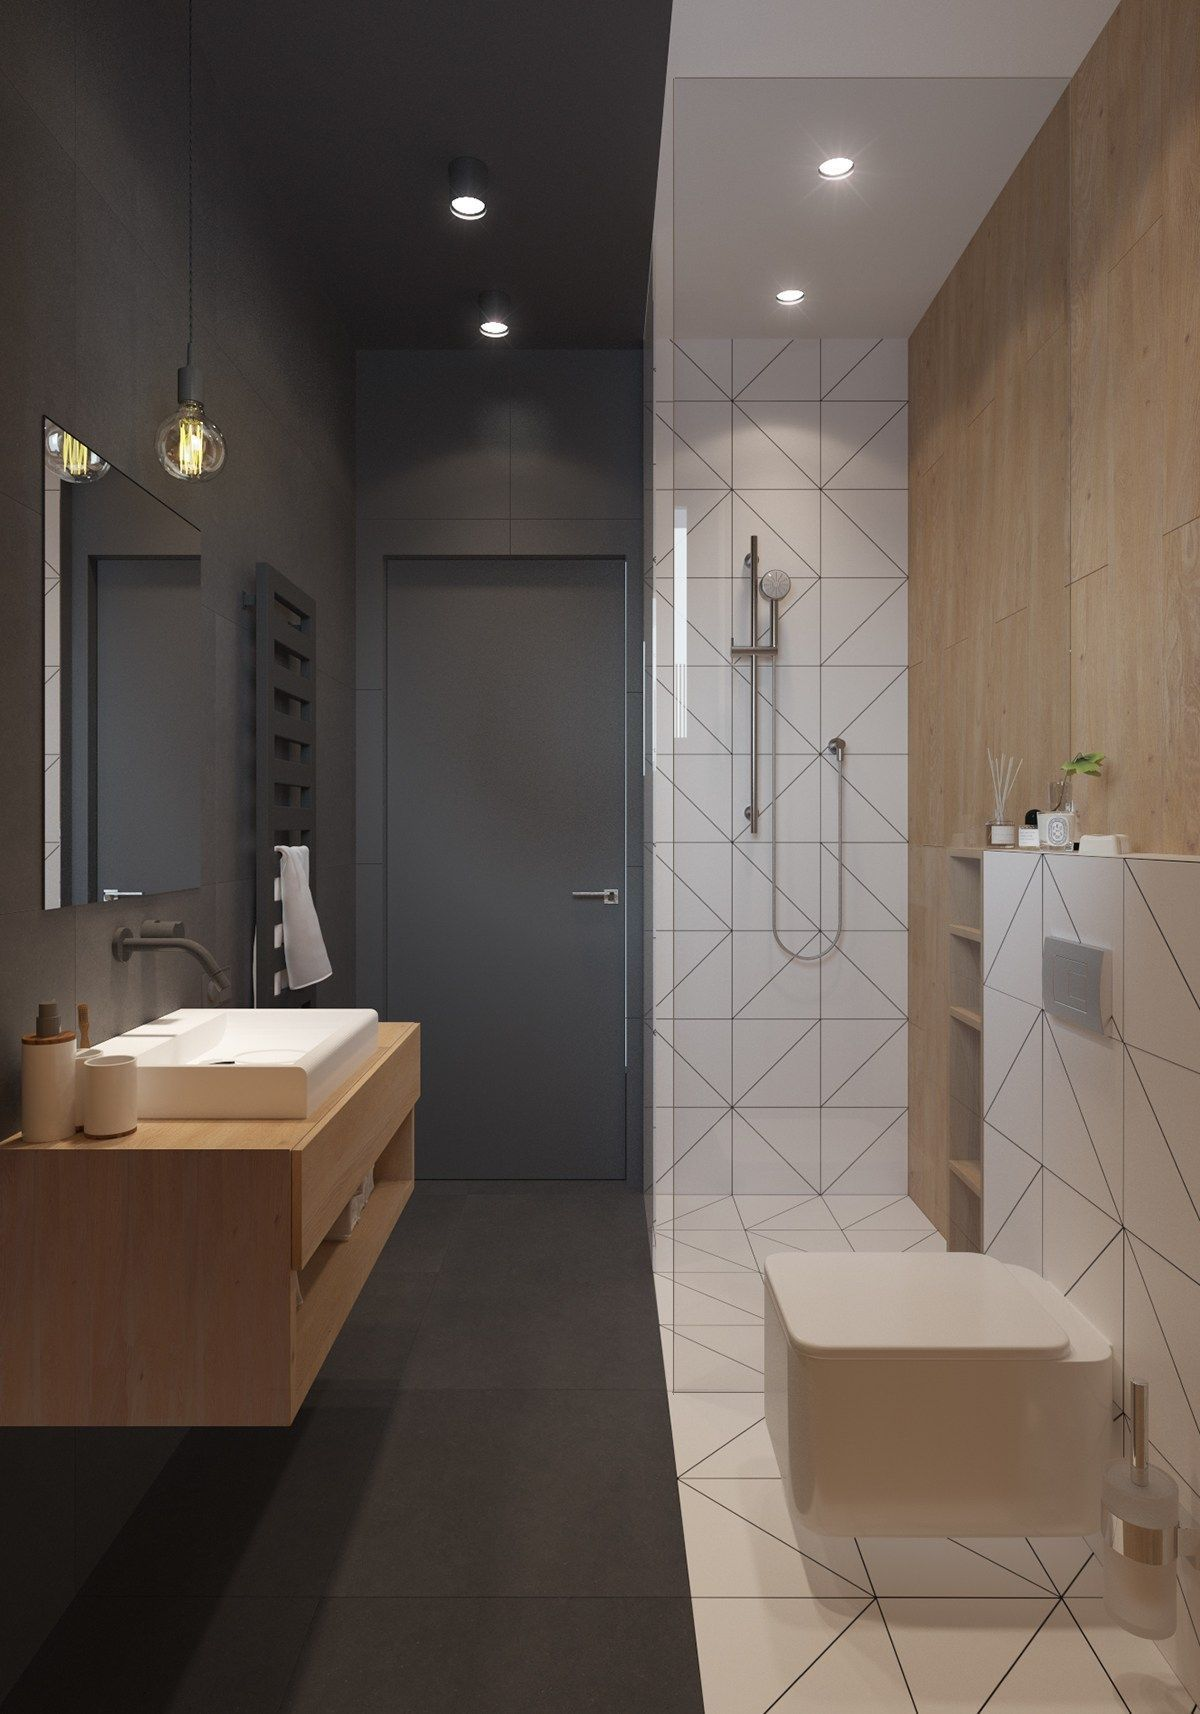 Nice Use Of The Muuto E27 In This Lovely Wash Room Modern Bathroom Design Bathroom Interior Design Minimalist Bathroom